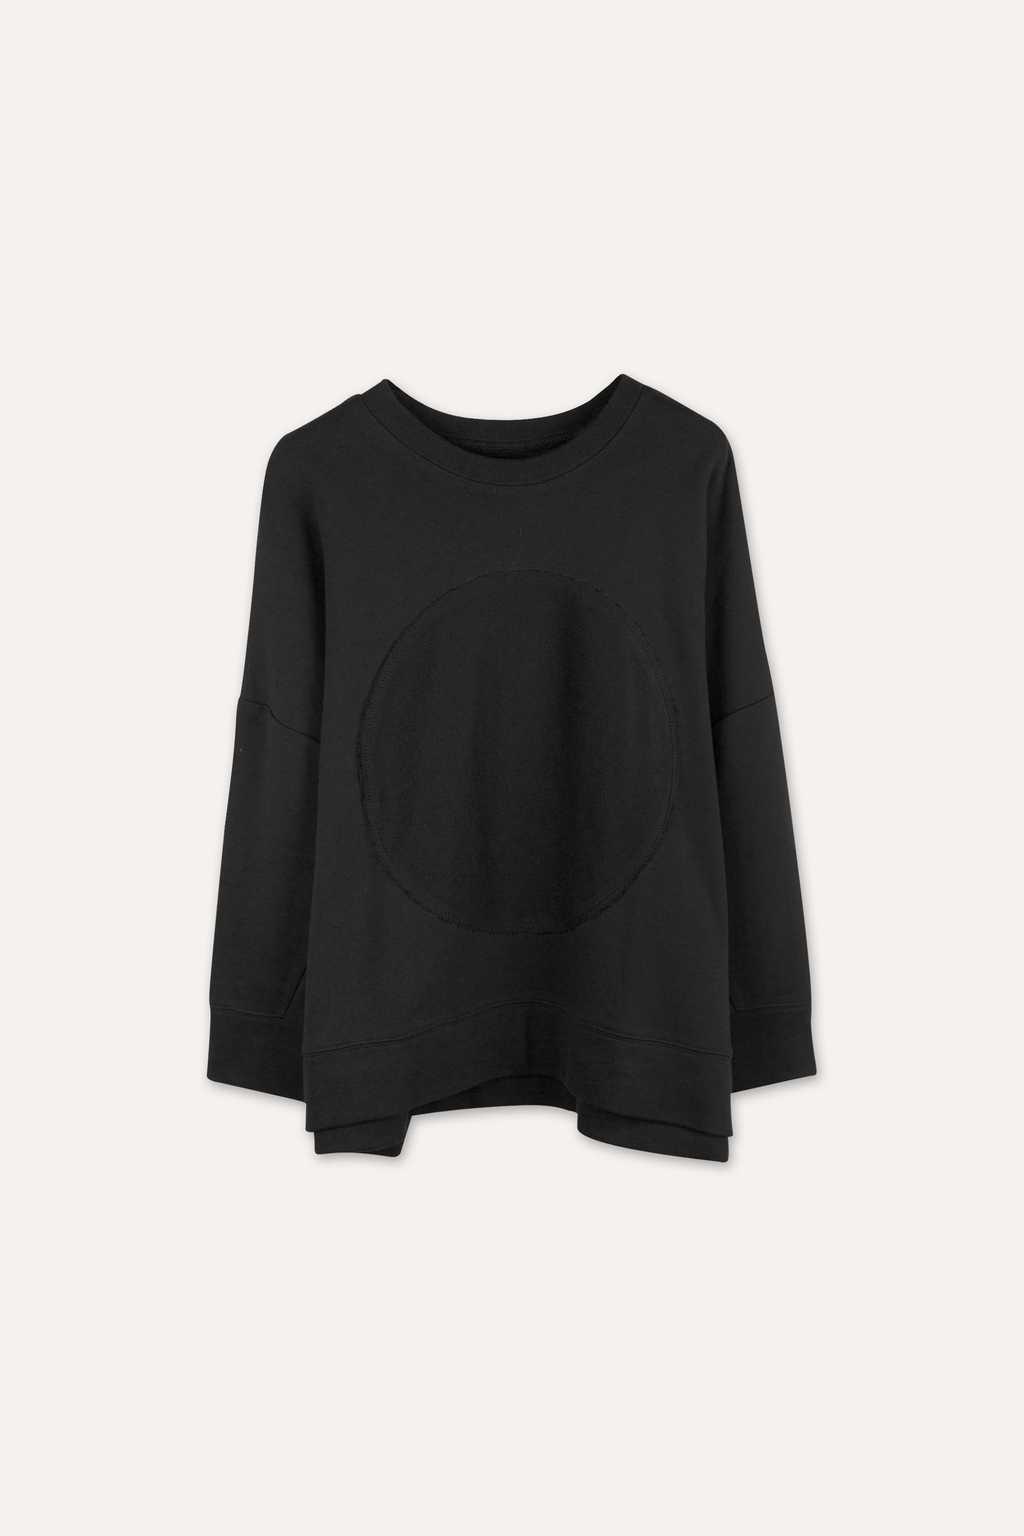 Sweatshirt 1521 Black 9